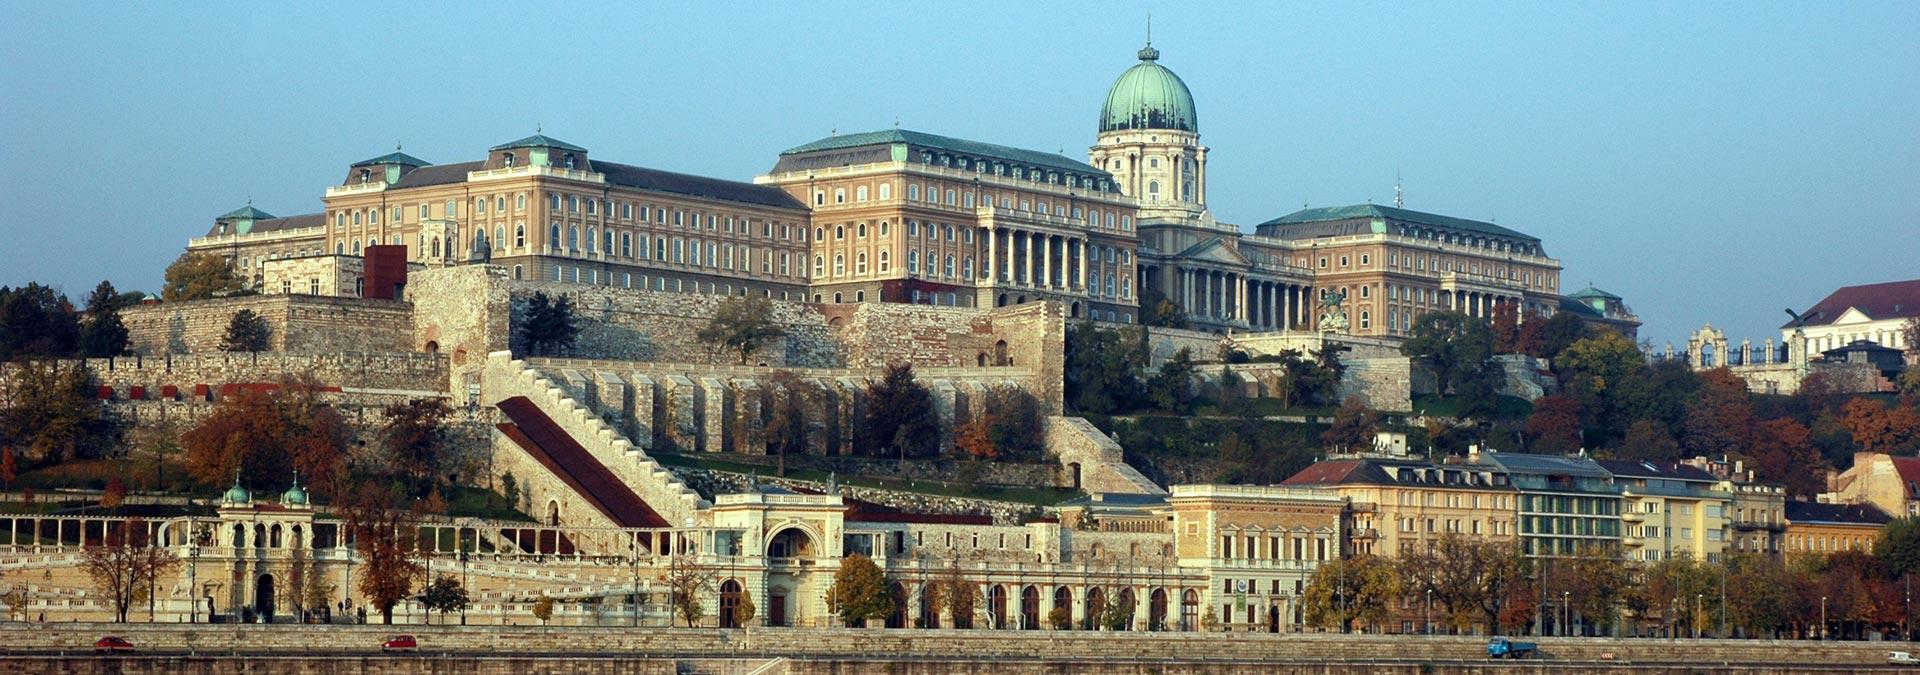 Tour from Budapest to Krakow - Hungary, Slovakia, Poland - Budapest, Bratislava, Krakow, Slovakia Travel, Location